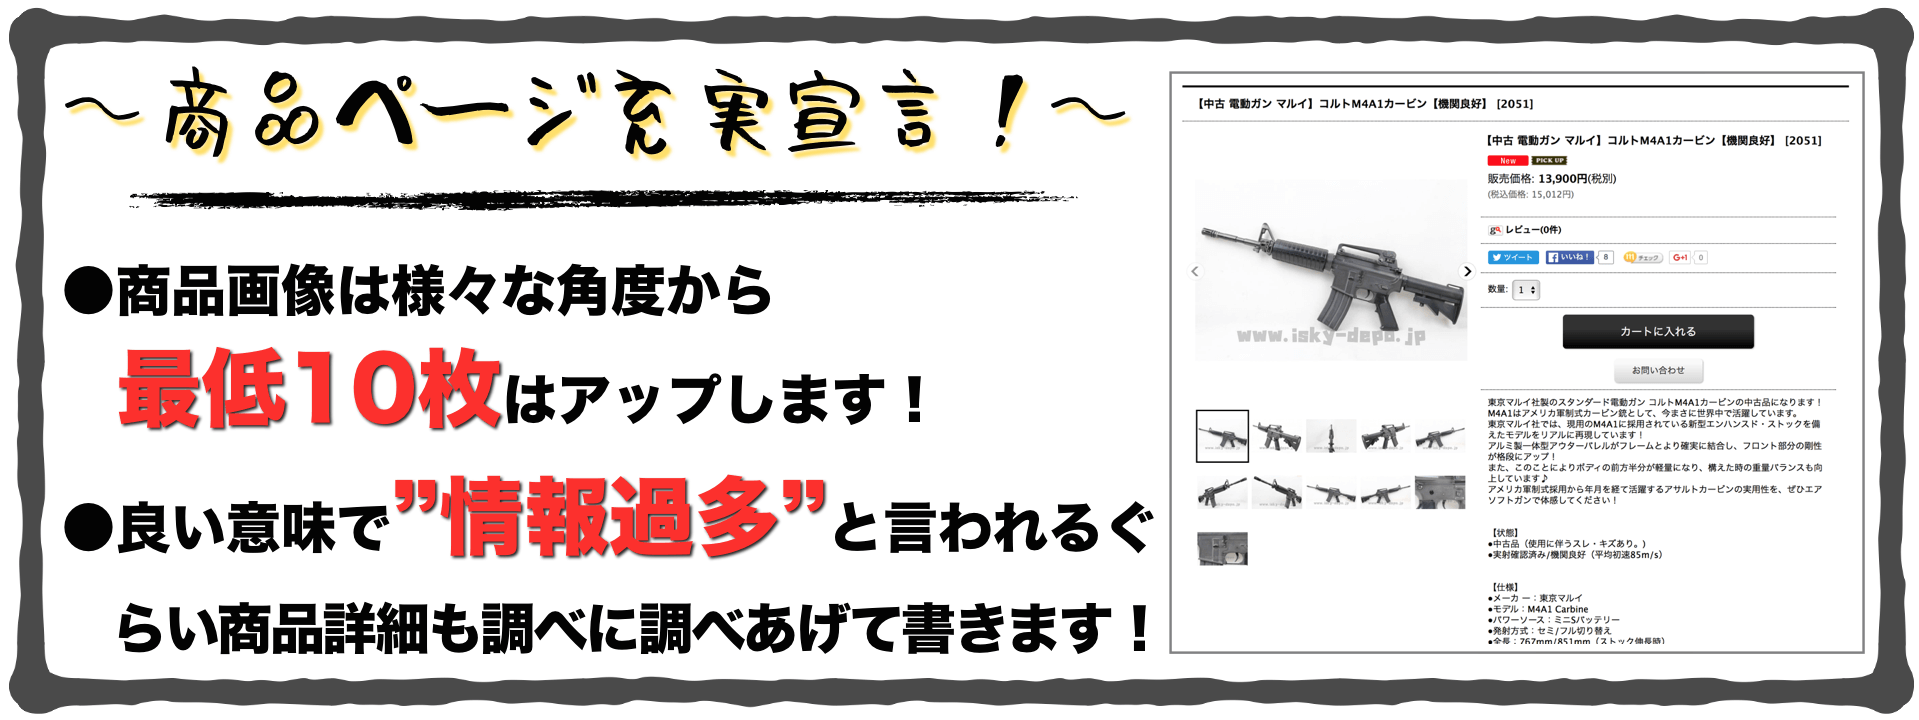 ISKY.DEPO商品ページ充実宣言!